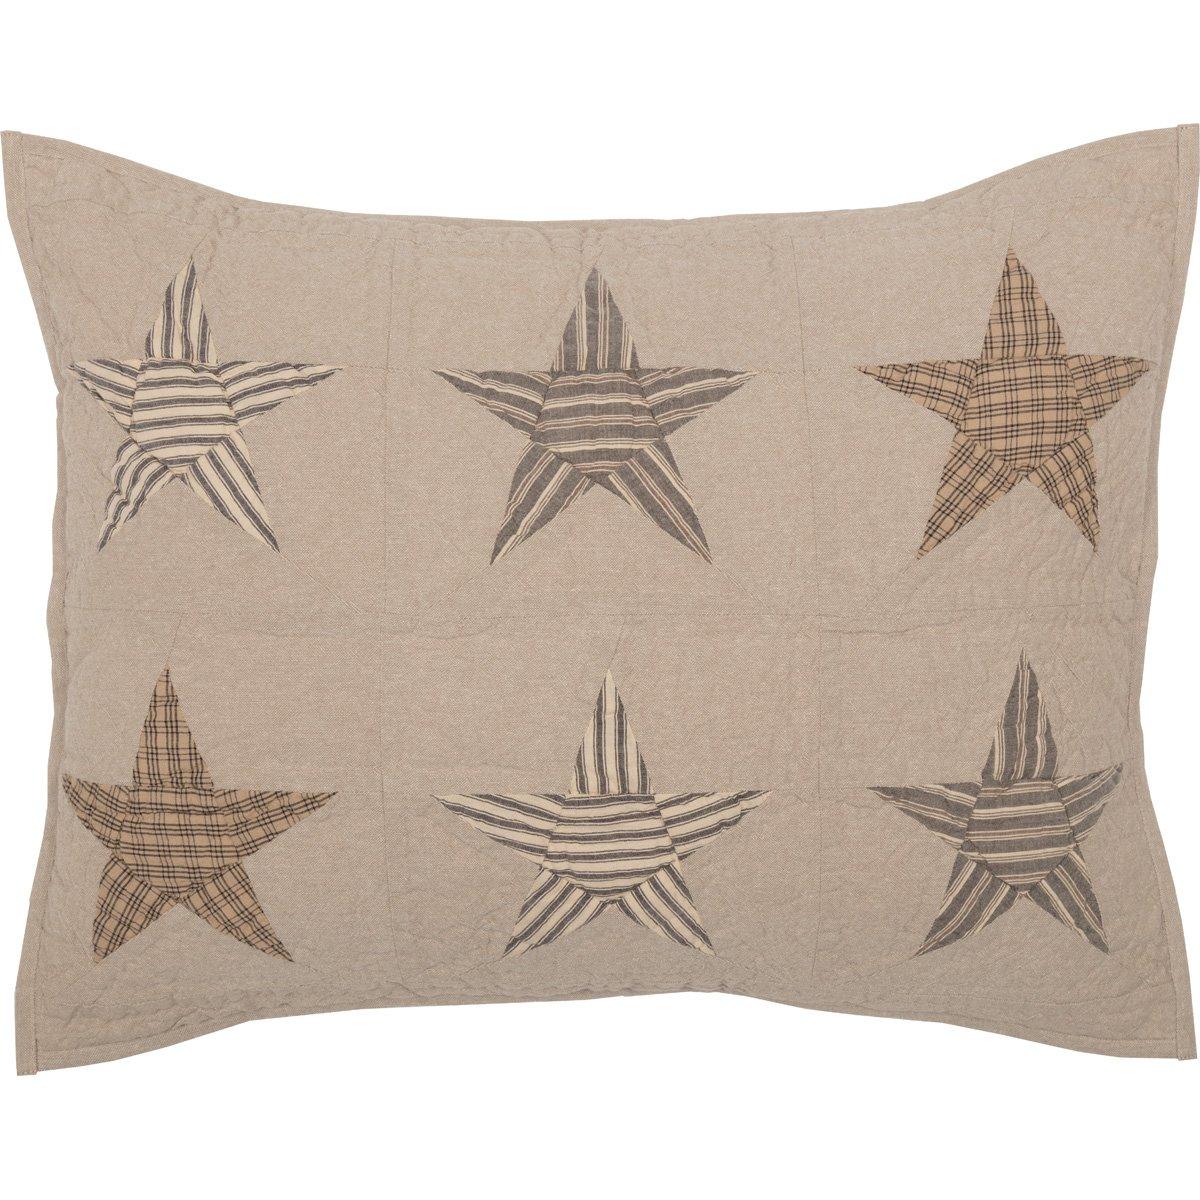 VHC Brands Farmhouse Bedding Sawyer Mill Star Sham, Standard, Tan